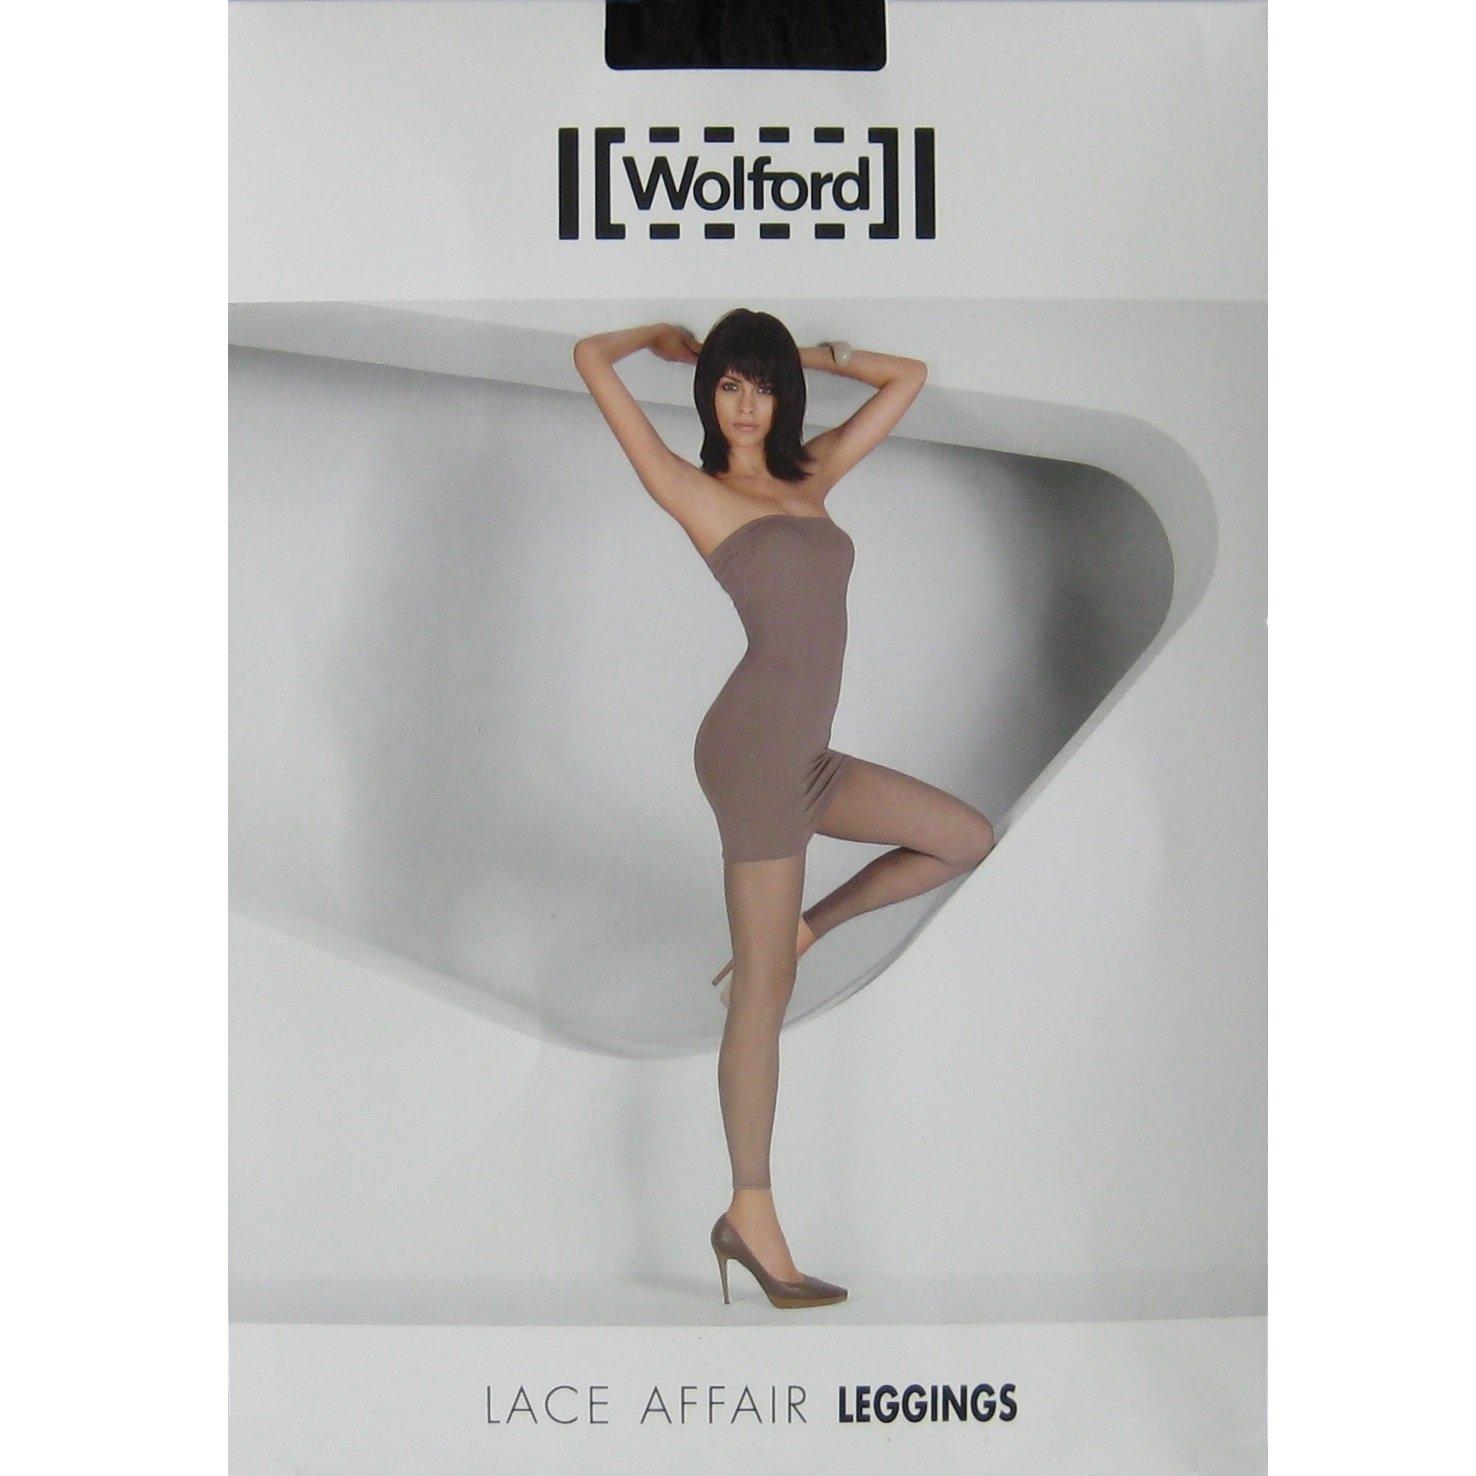 NIP Wolford Lace Affair Leggings #19054 - Mocca (Chocolate Brown) - XS